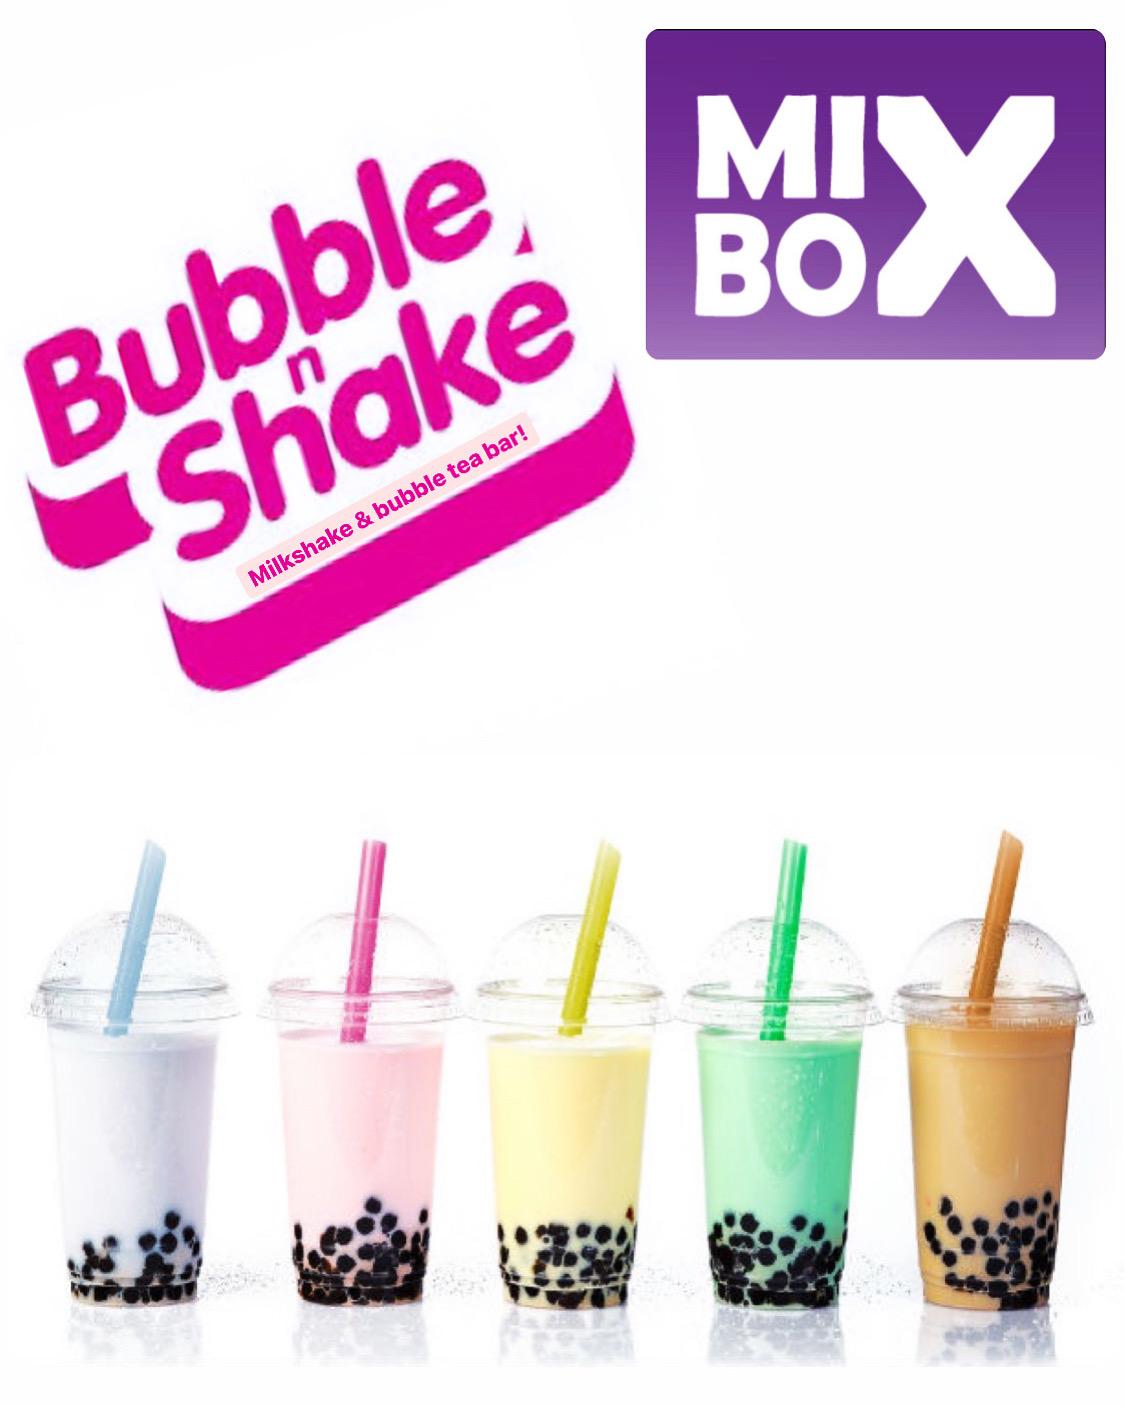 Bubble tea и bubble shake те очакват в MIXBOX